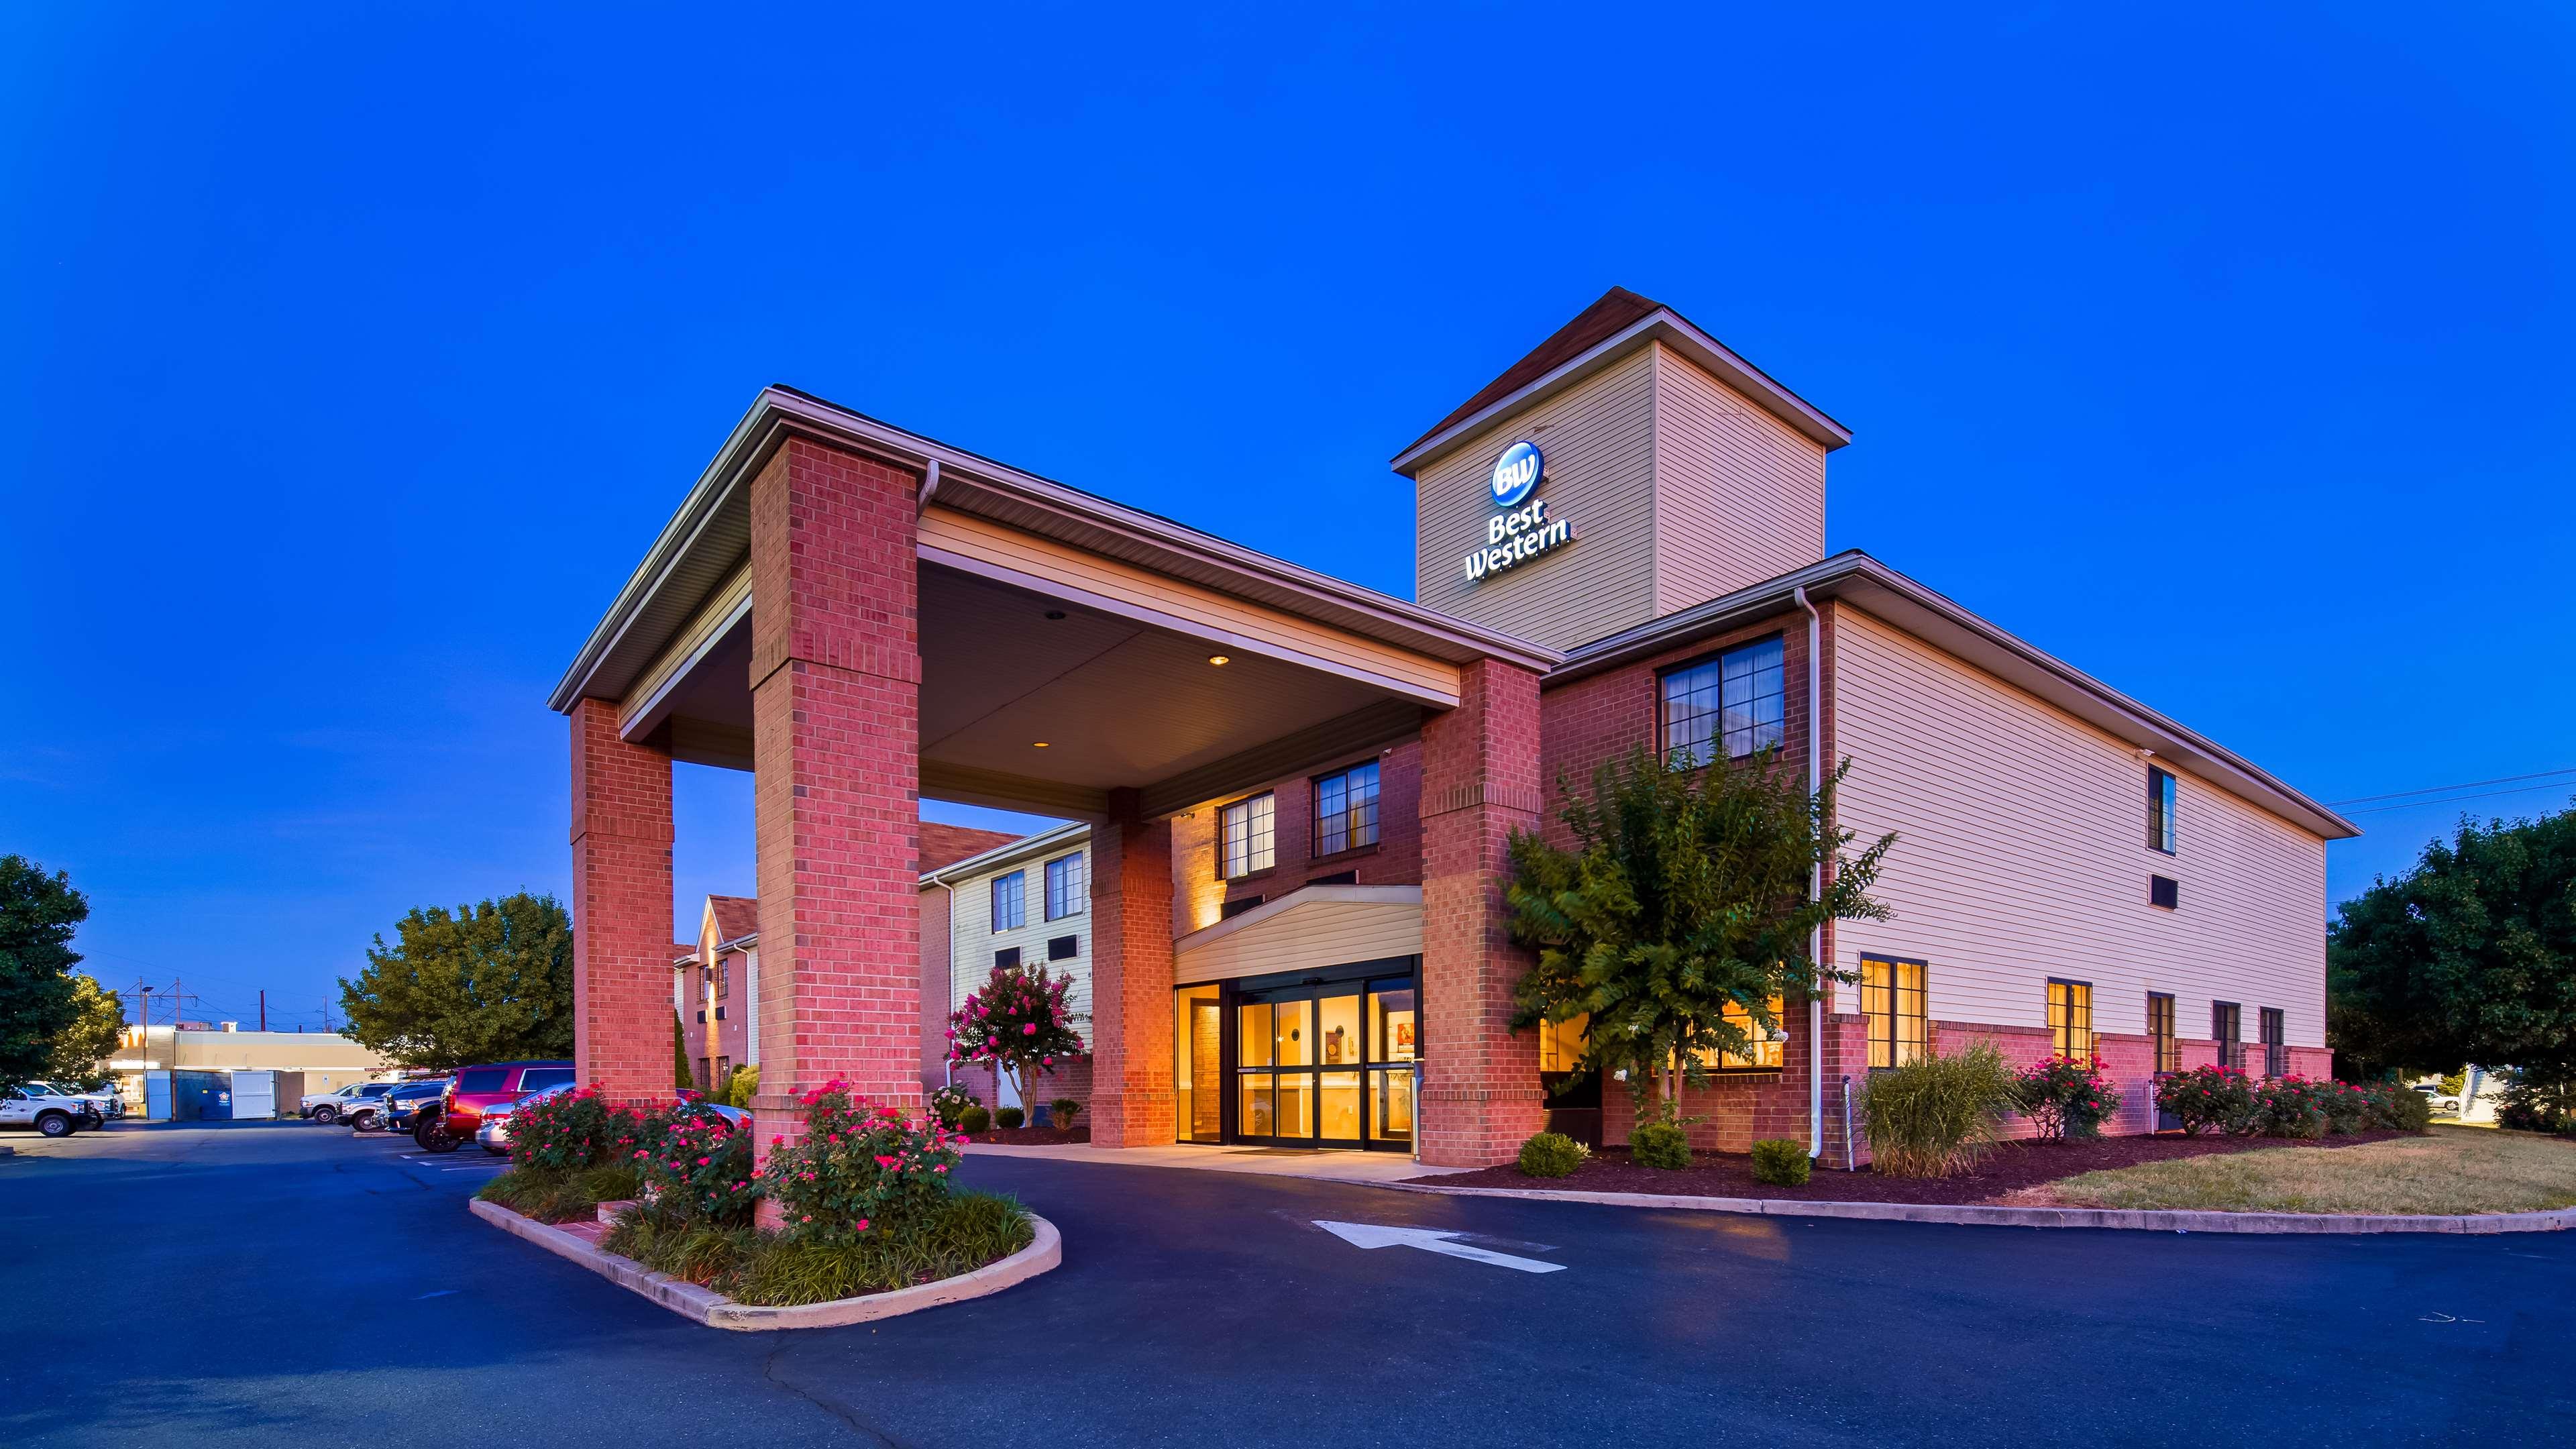 Best Western Denton Inn image 0